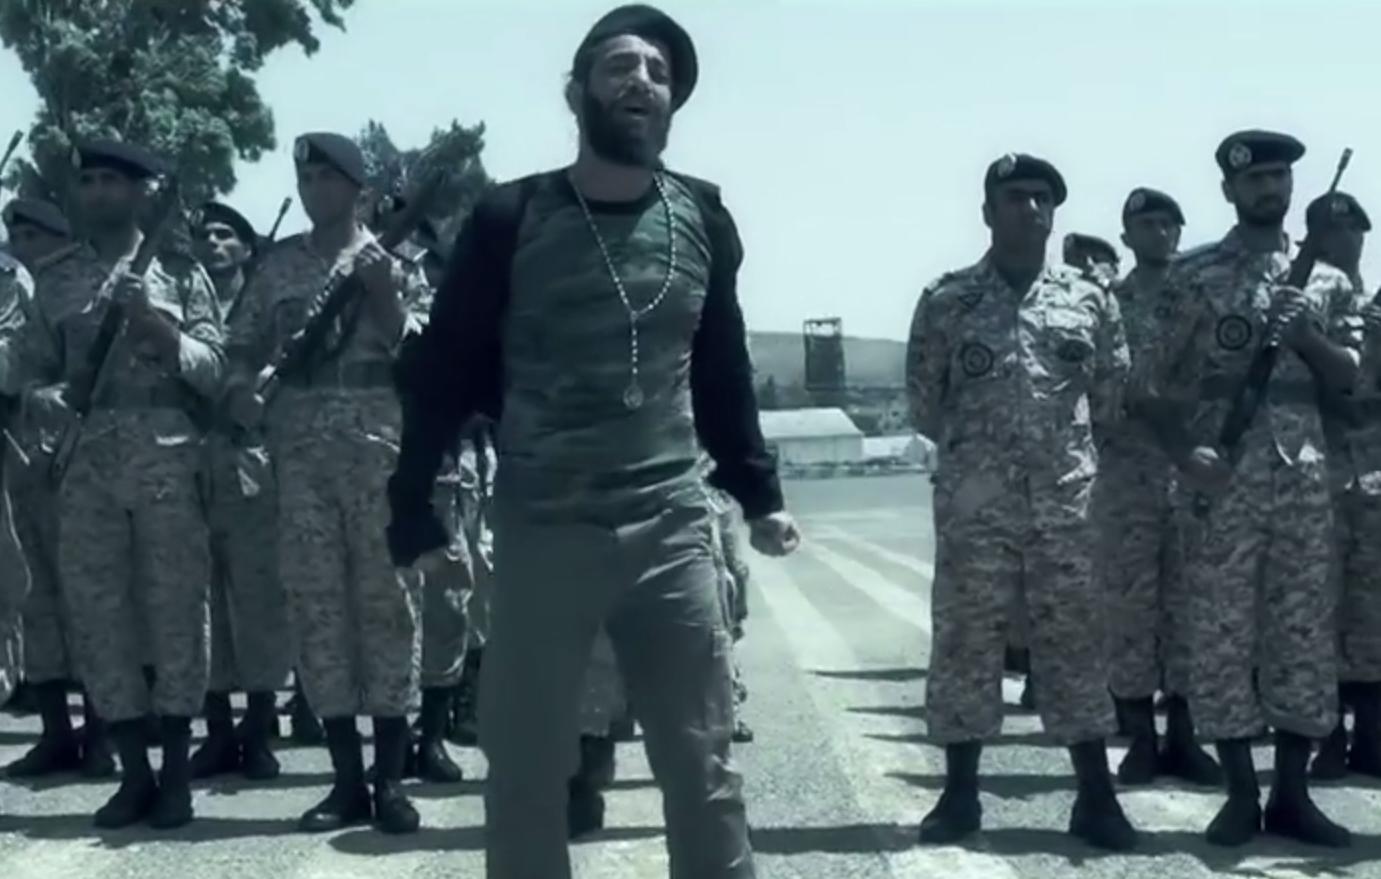 Screengrab from Amir Tataloo's music video.